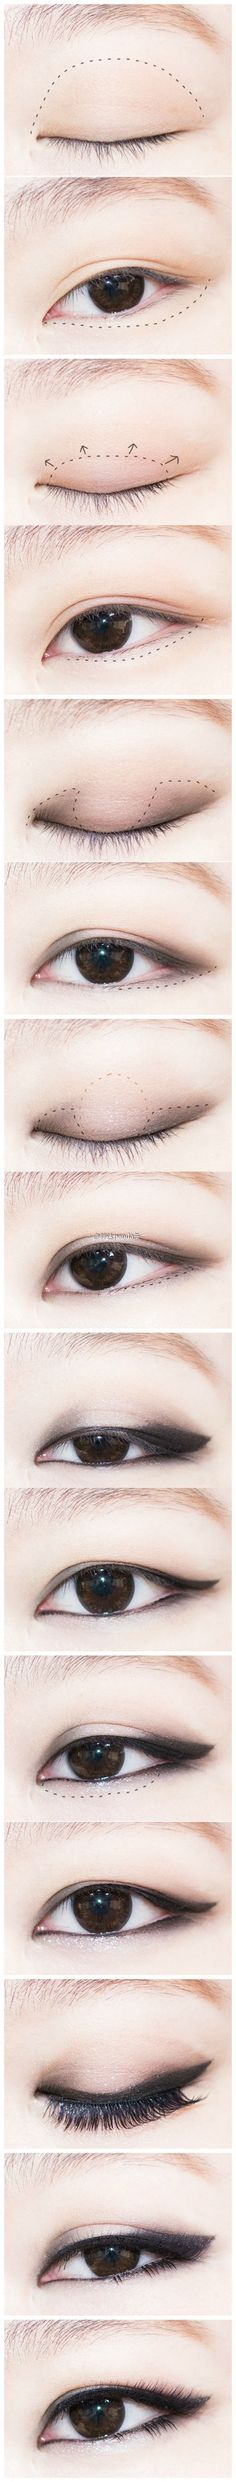 Natural Fig Makeup by Hyojin - Korean Makeup Asian Makeup Tips, Asian Makeup Tutorials, Asian Makeup Looks, Korean Eye Makeup, Asian Make Up, Korean Make Up, Korean Wedding Makeup, Gyaru Hair, Makeup Hacks